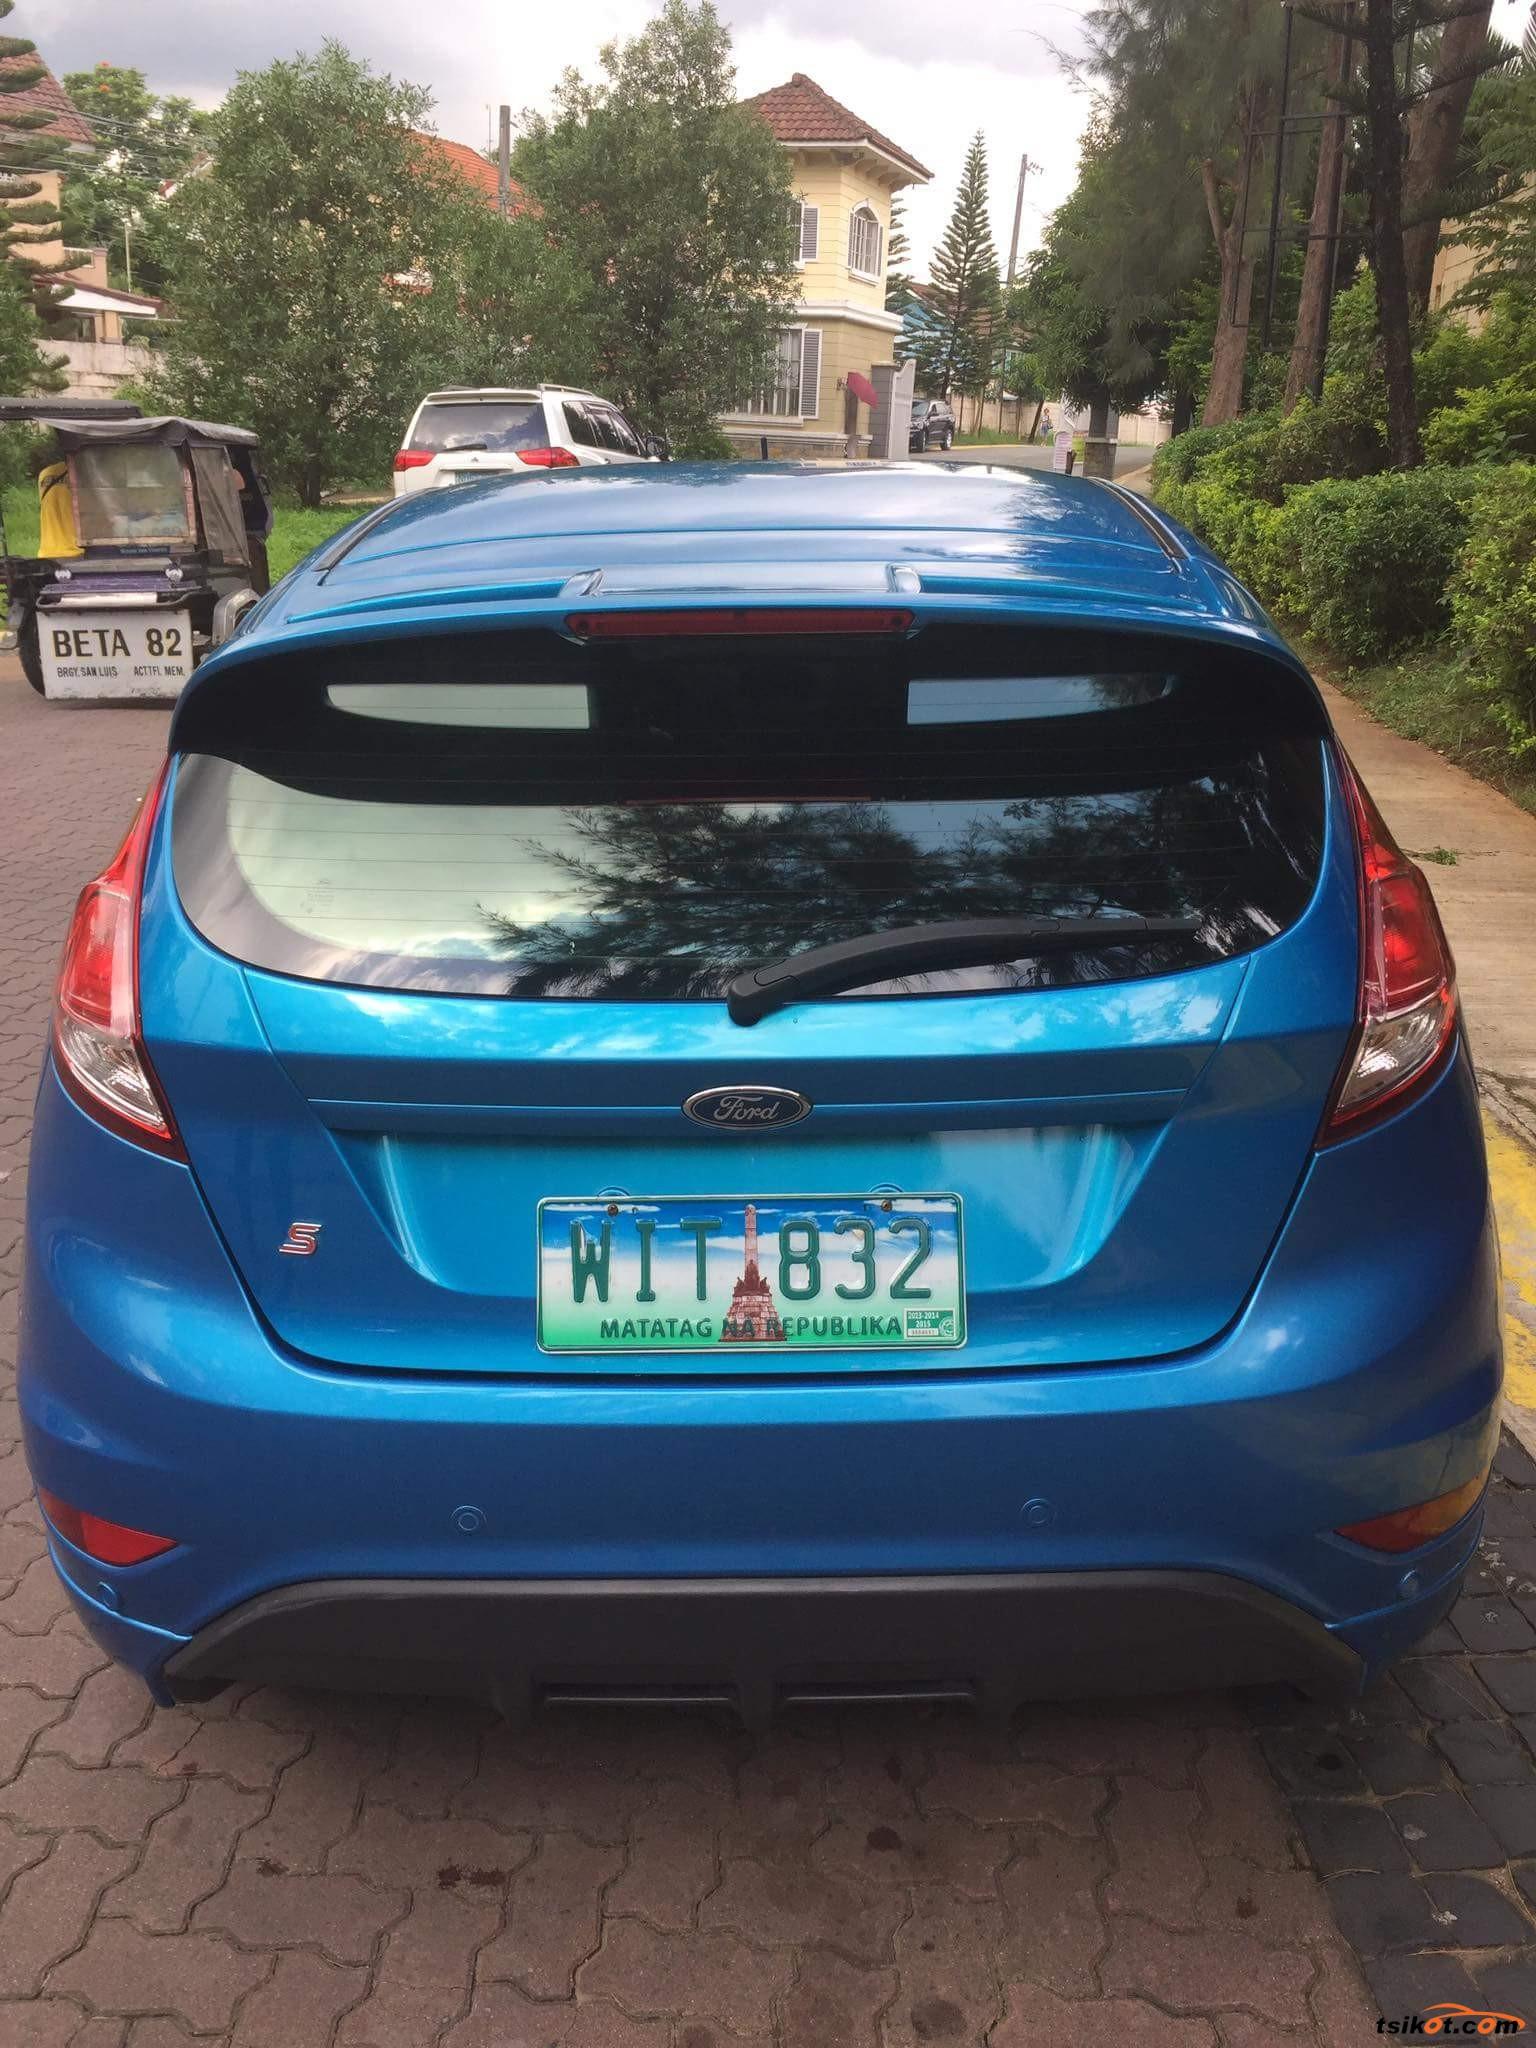 Ford Fiesta 2014 - 6